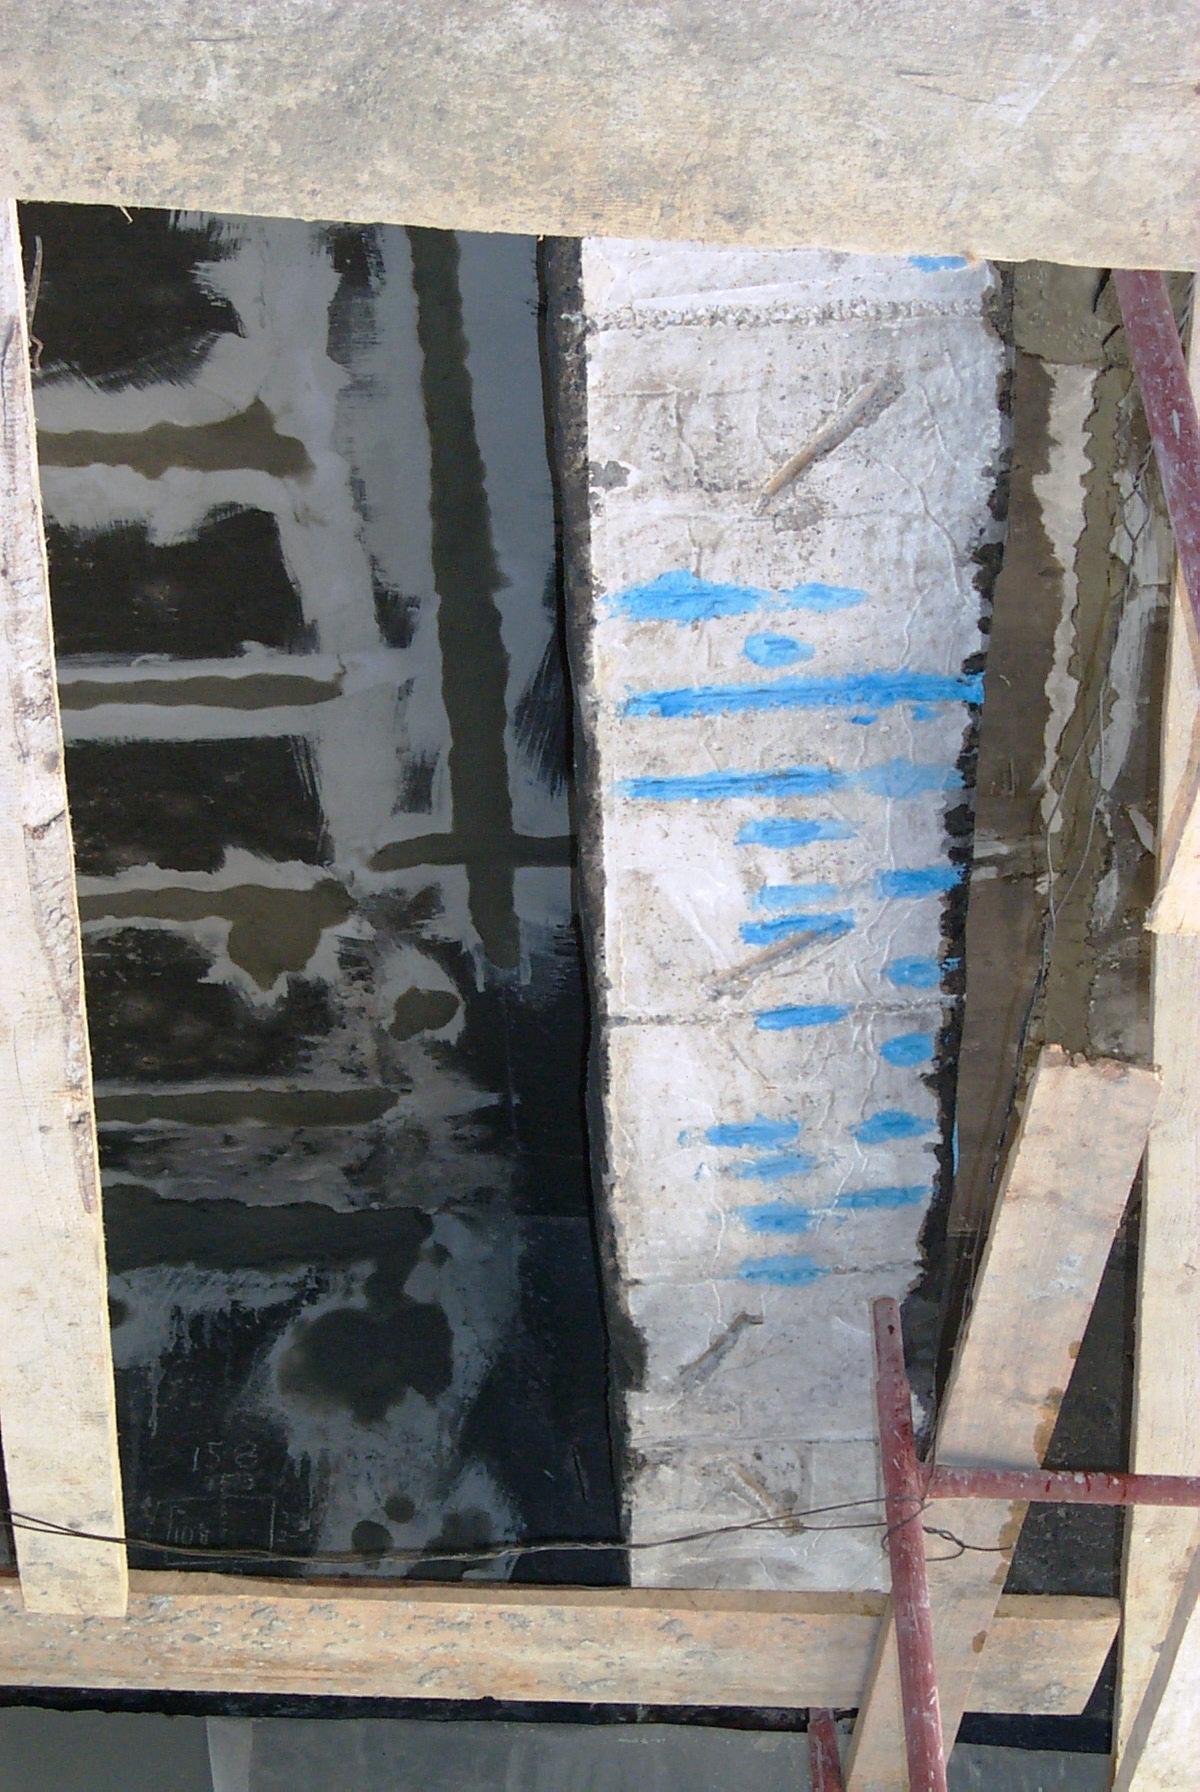 Reparatii pasaje km 11 si 13 pe A1 MAPEI - Poza 29